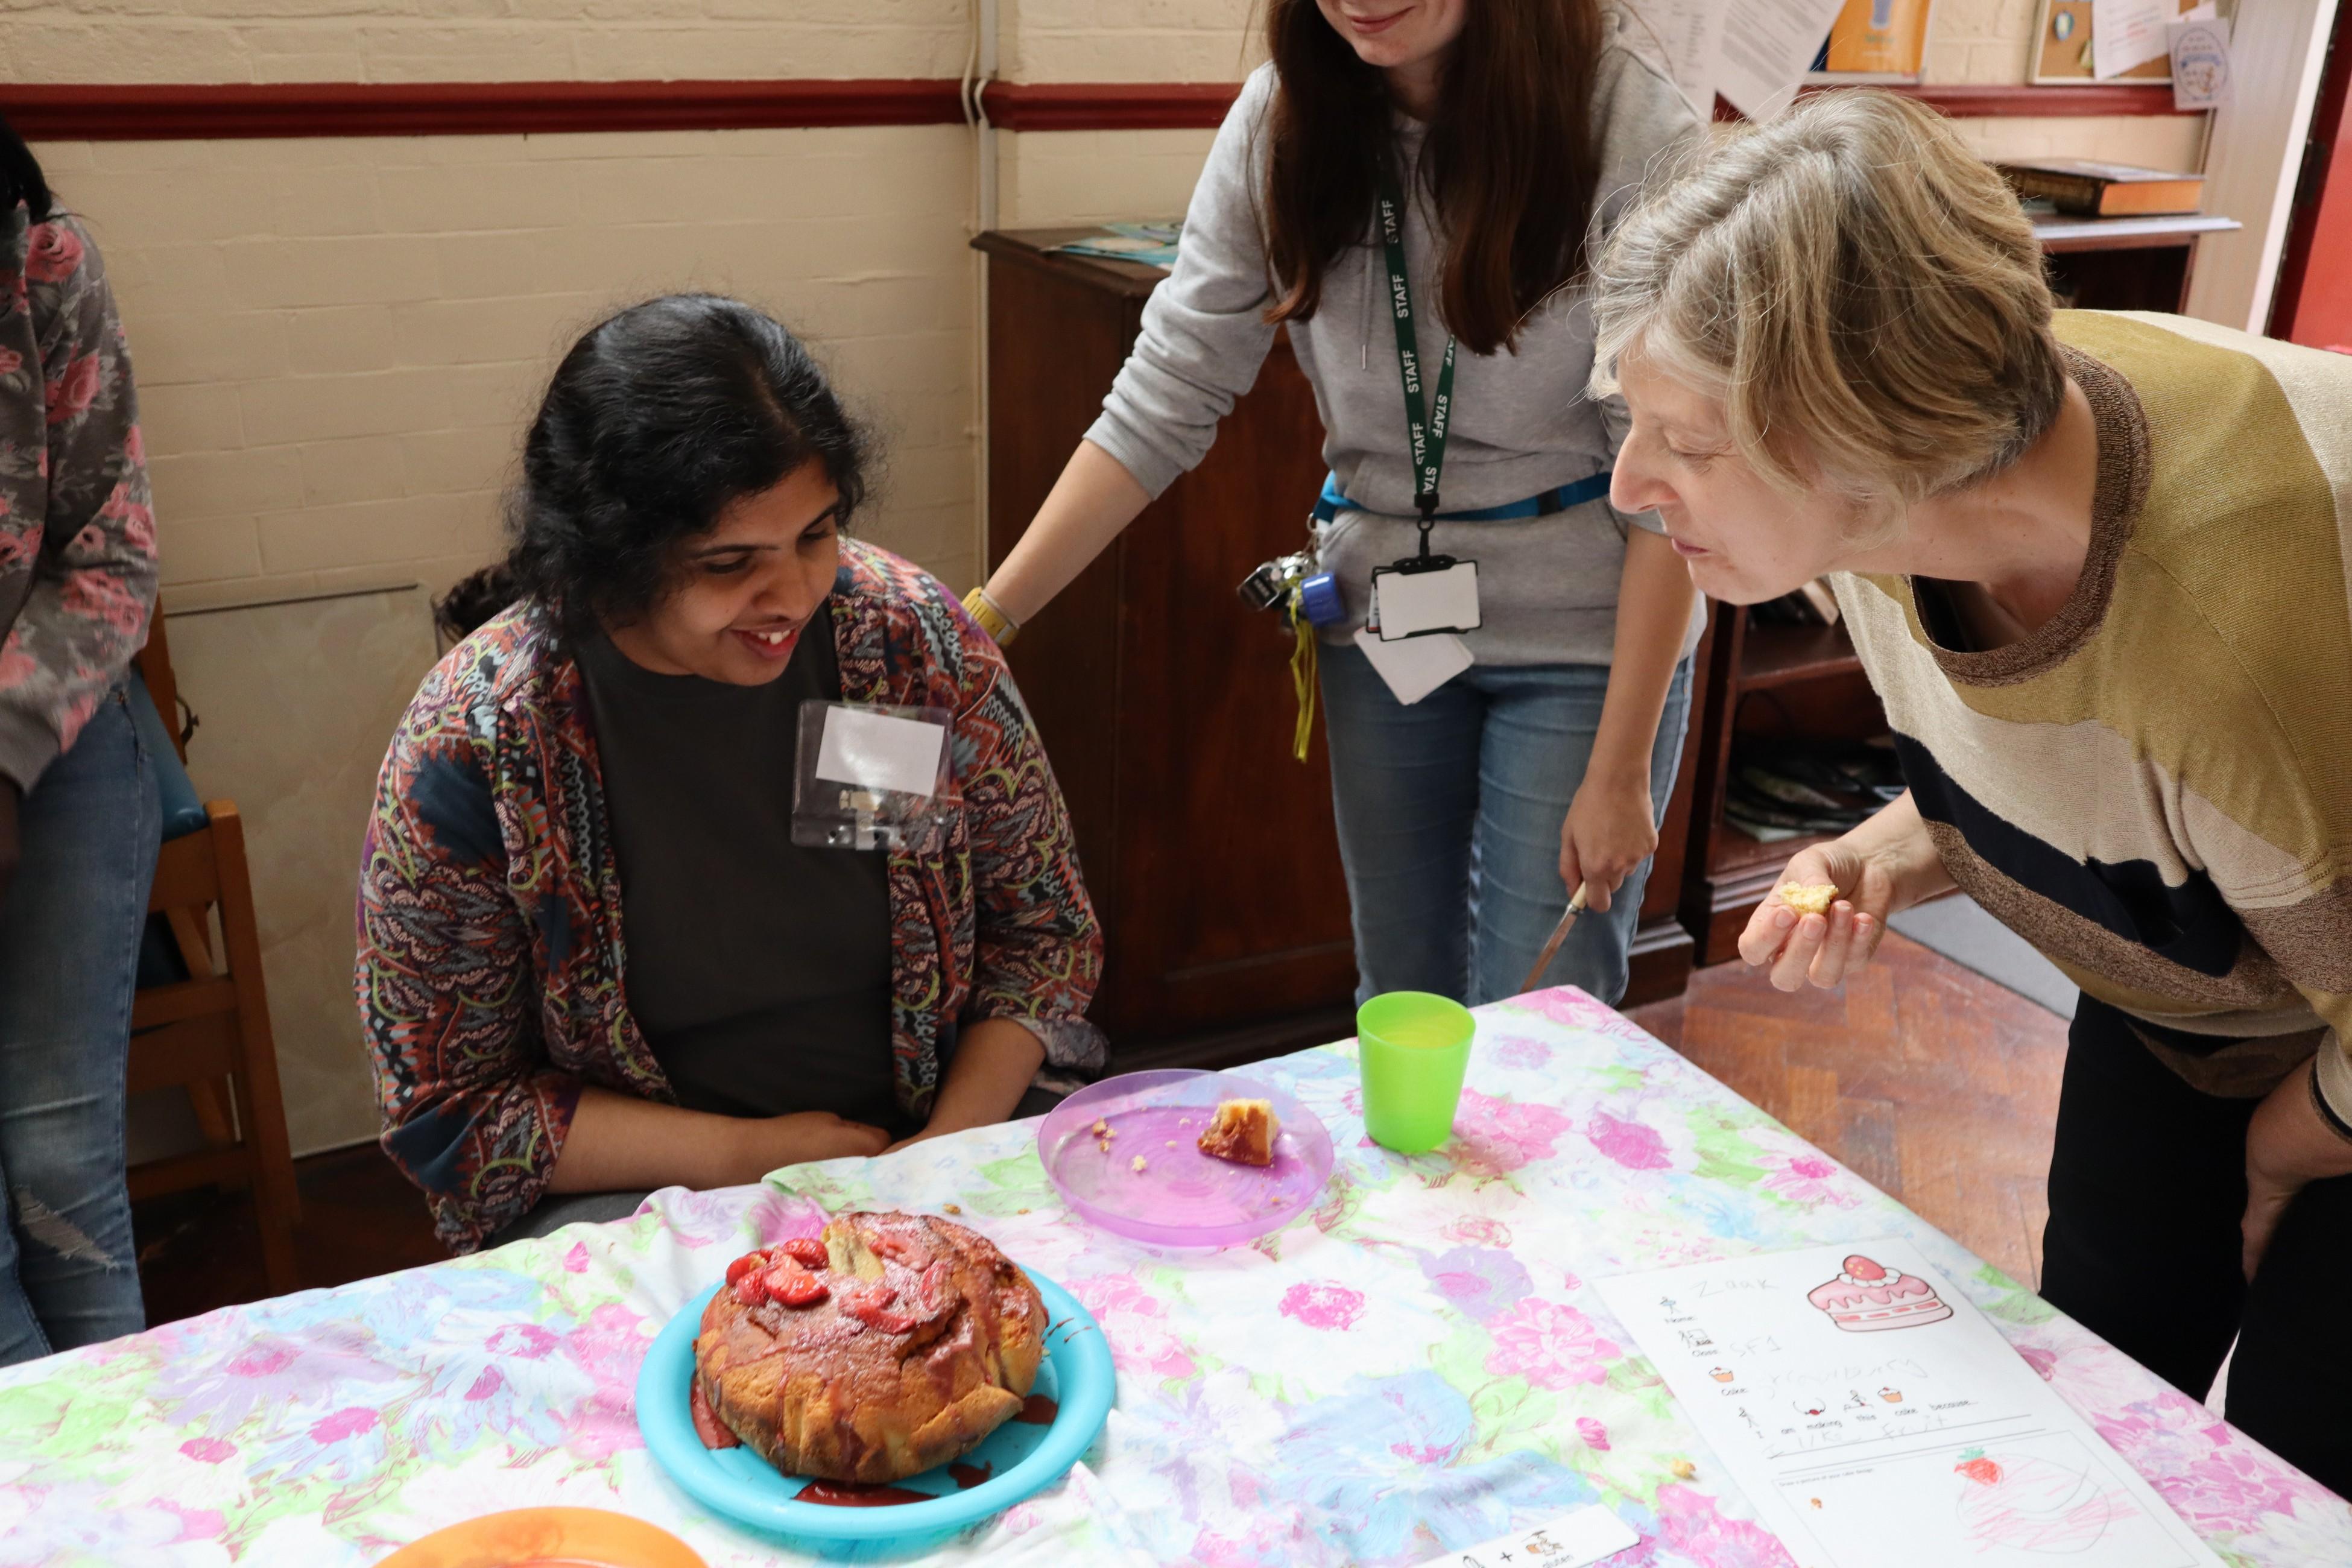 Judge trying cake